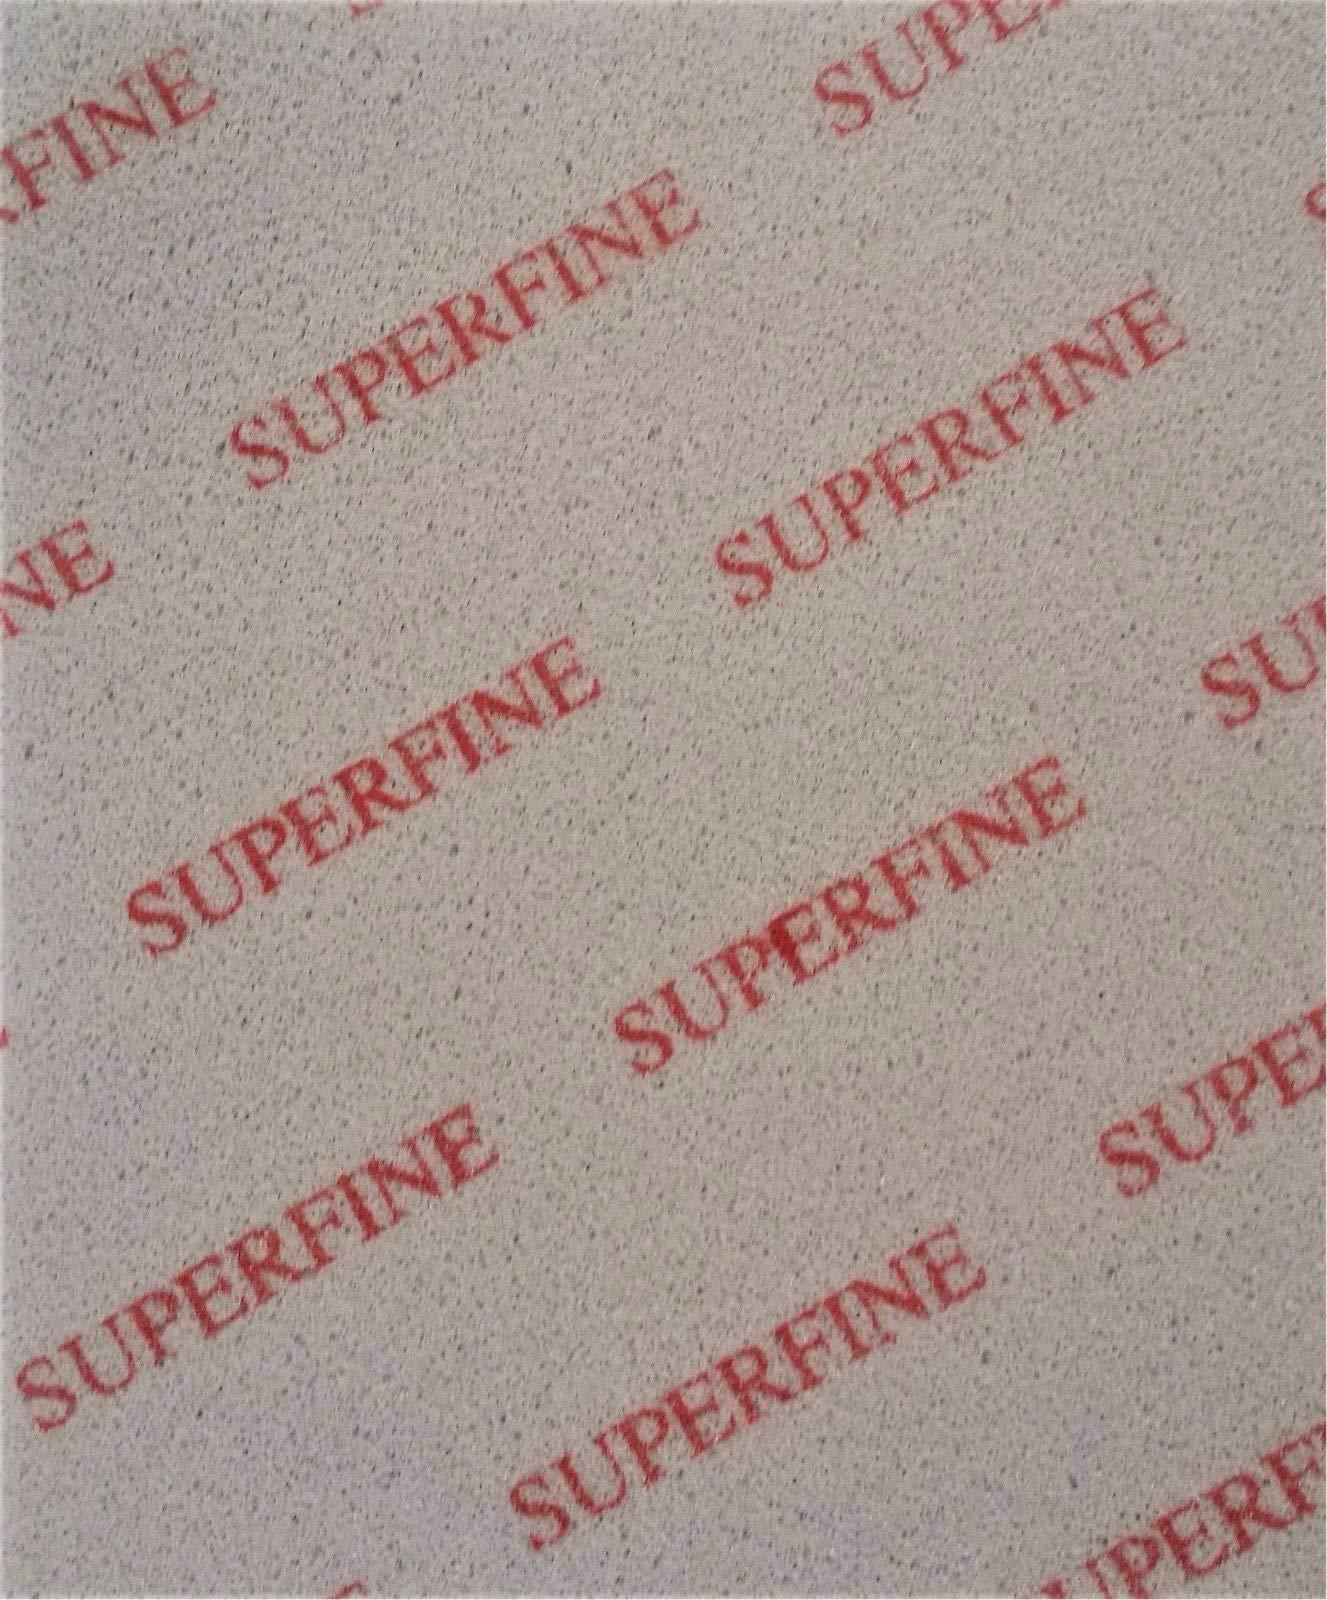 20pc Micro Ultra Super Fine Medium Softback Sanding Sponge Detailing Abrasive (Superfine)